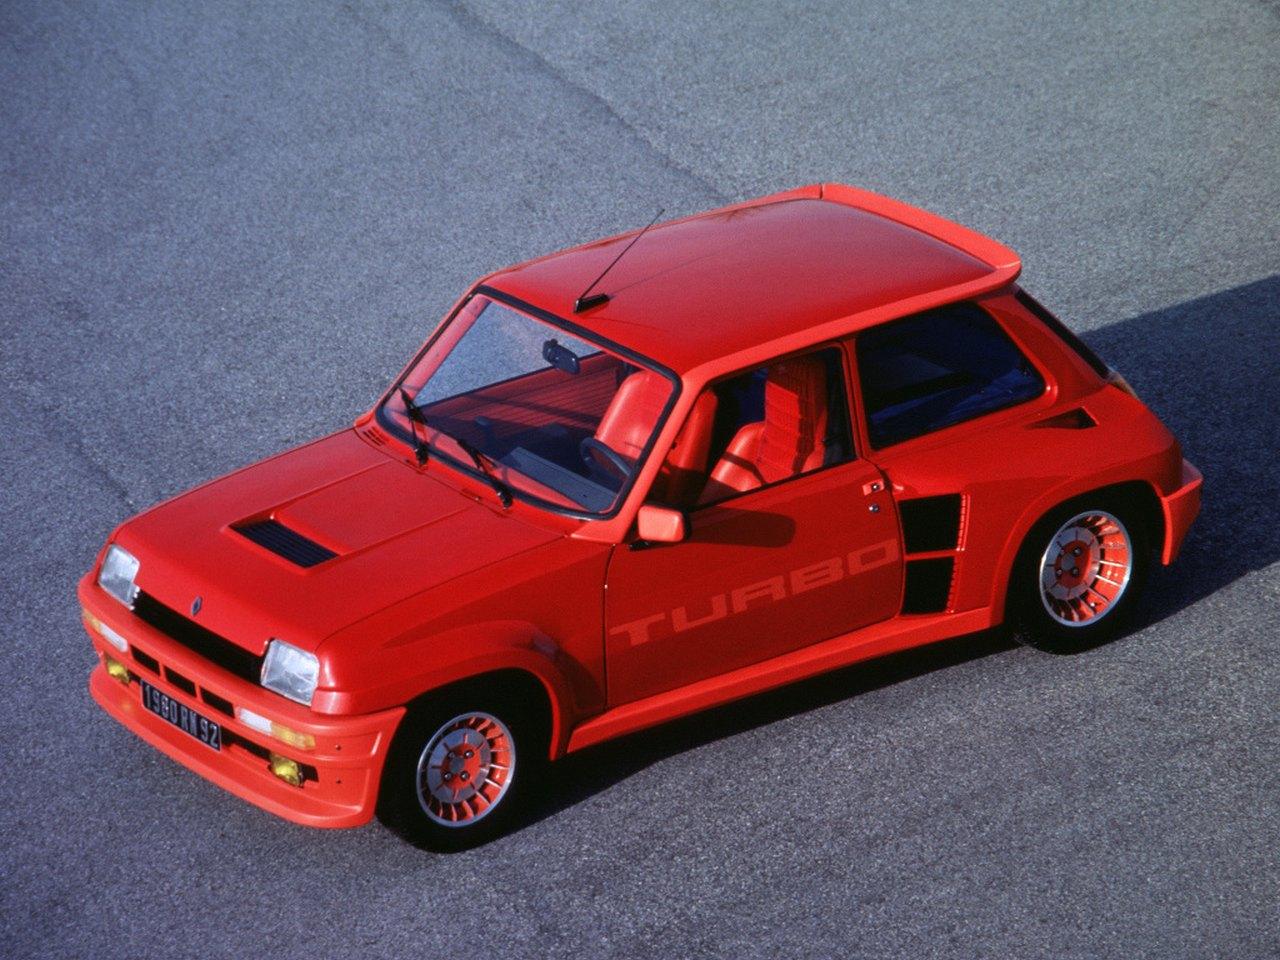 Renault-5-Turbo-youngtimer-01.jpg